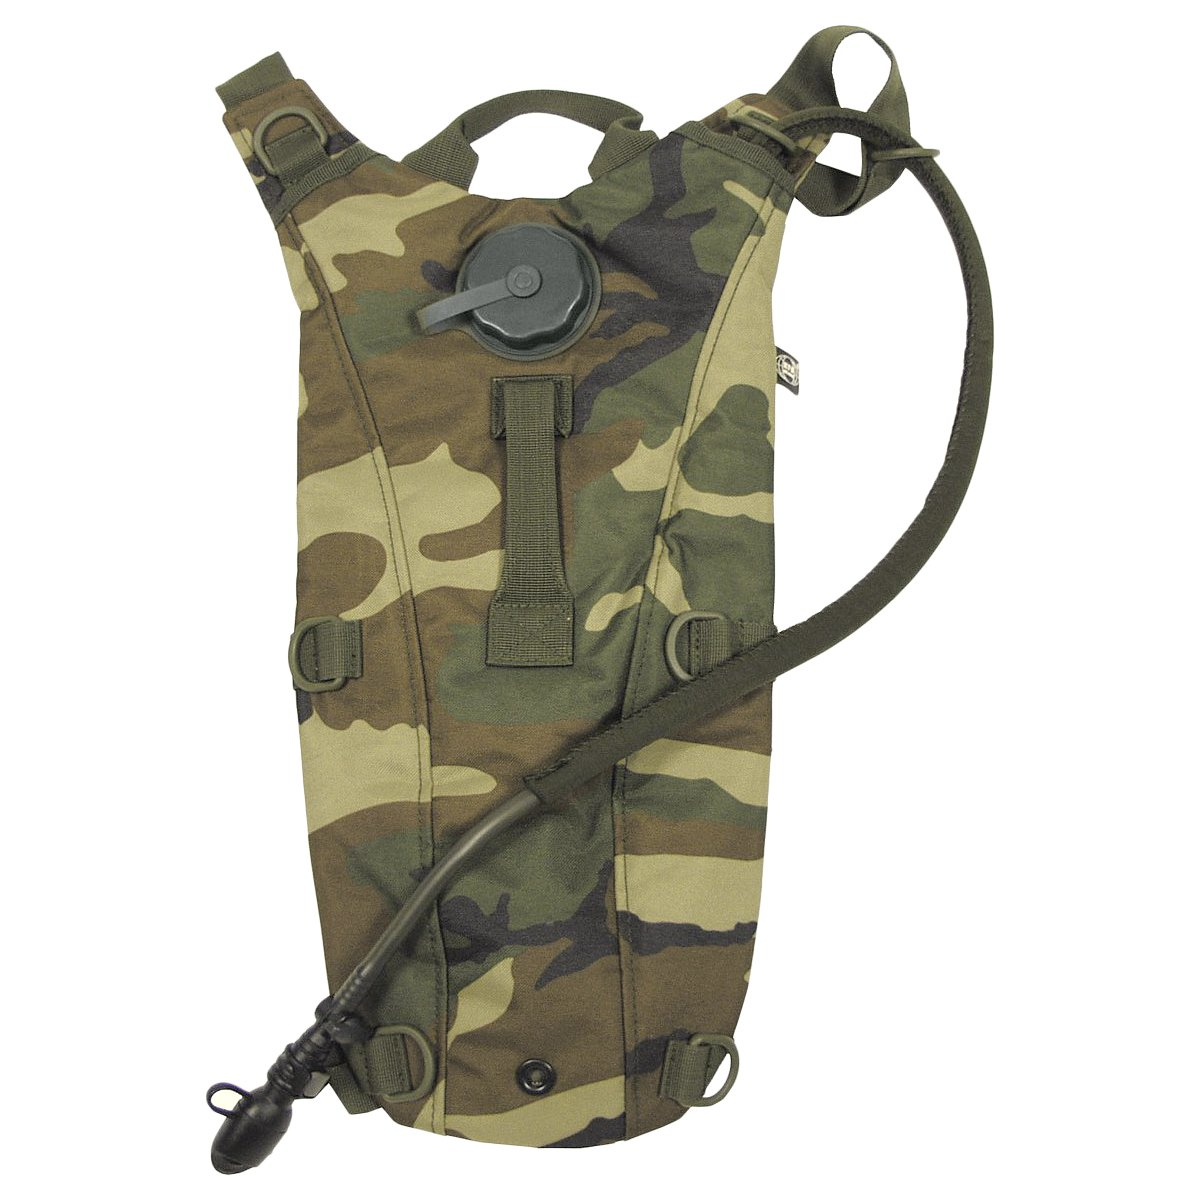 MFH Hydration Backpack TPU Extreme Woodland by MFH Max Fuchs